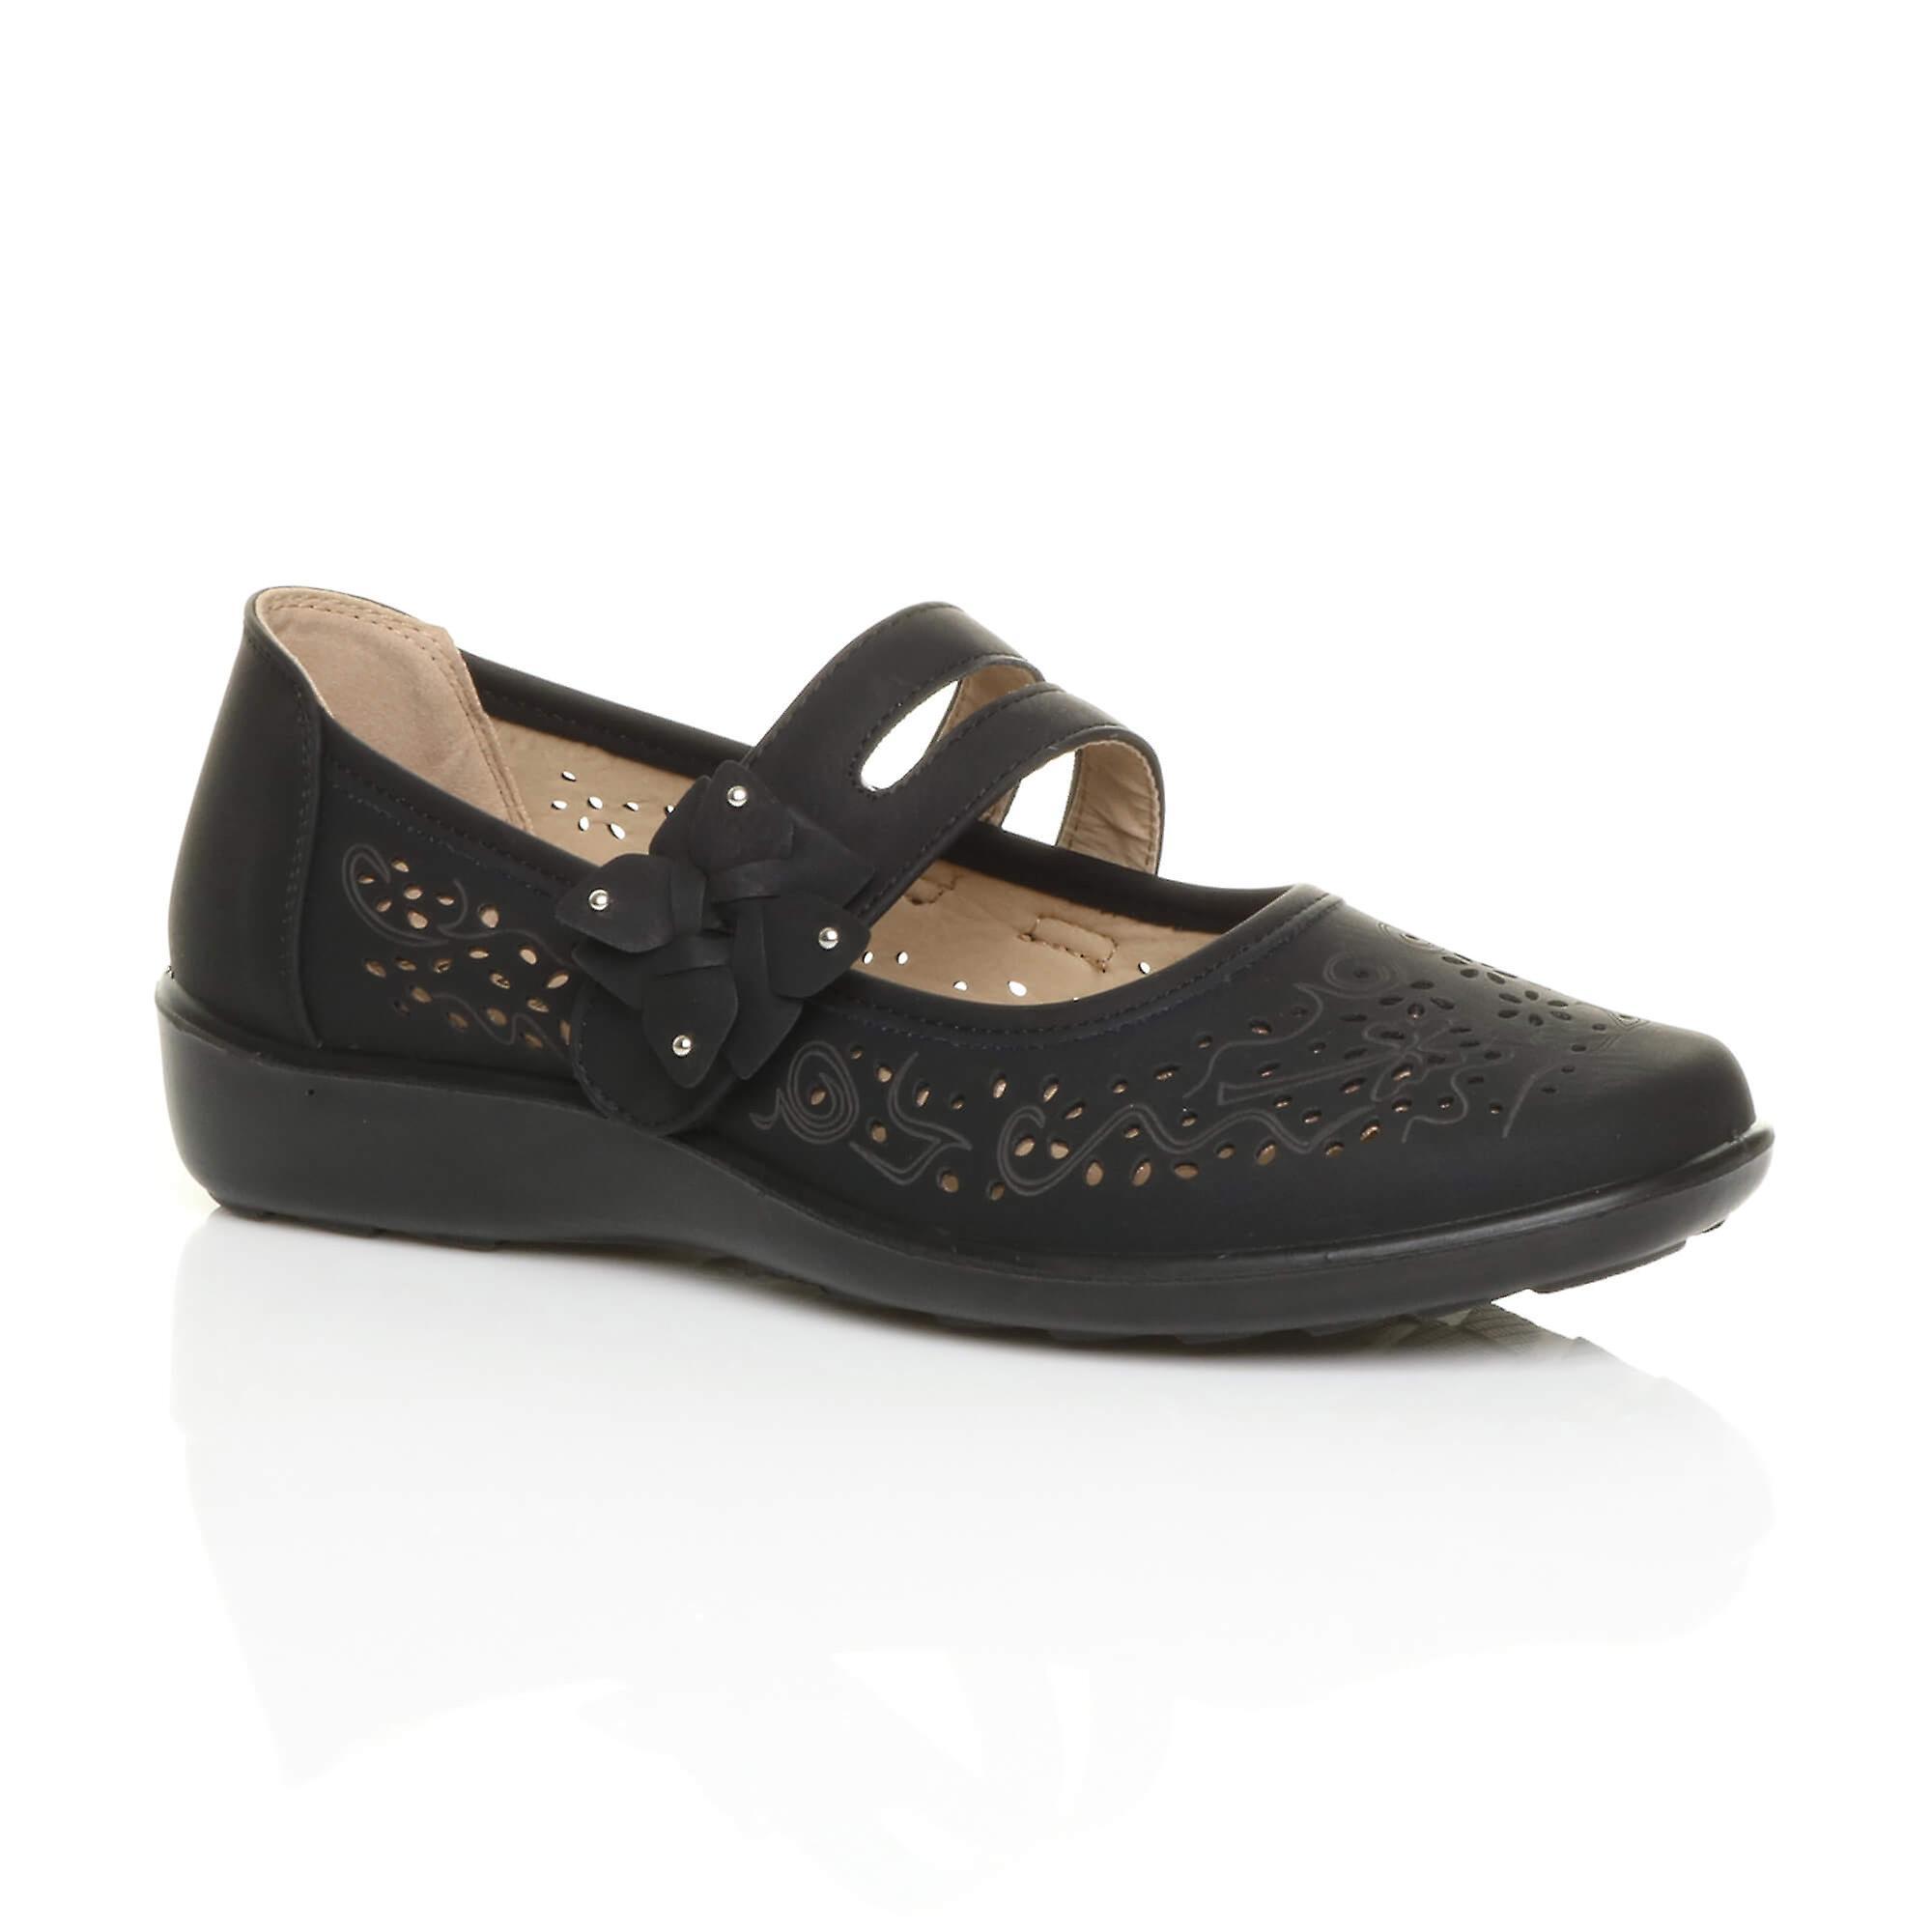 Ajvani womens flat grip sole padded cushioned mary jane hook & loop comfort shoes ZjYXg